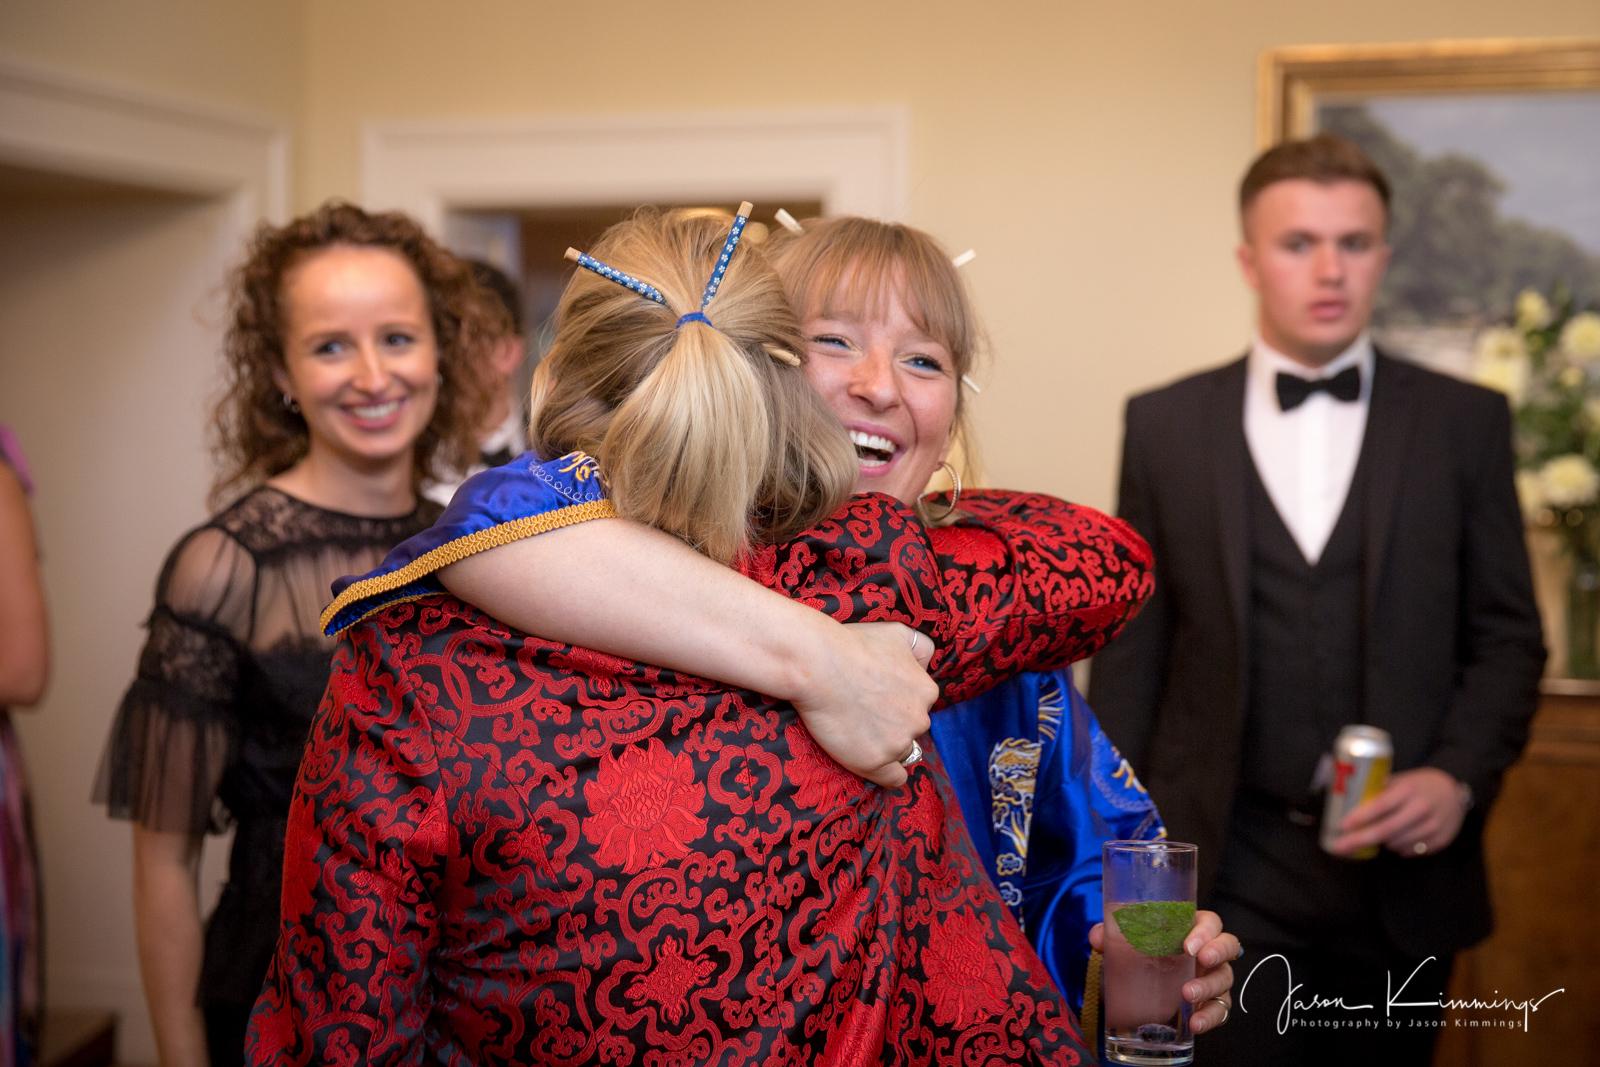 Party-event-photography-west-lothian-edinburgh-glasgow-2.jpg